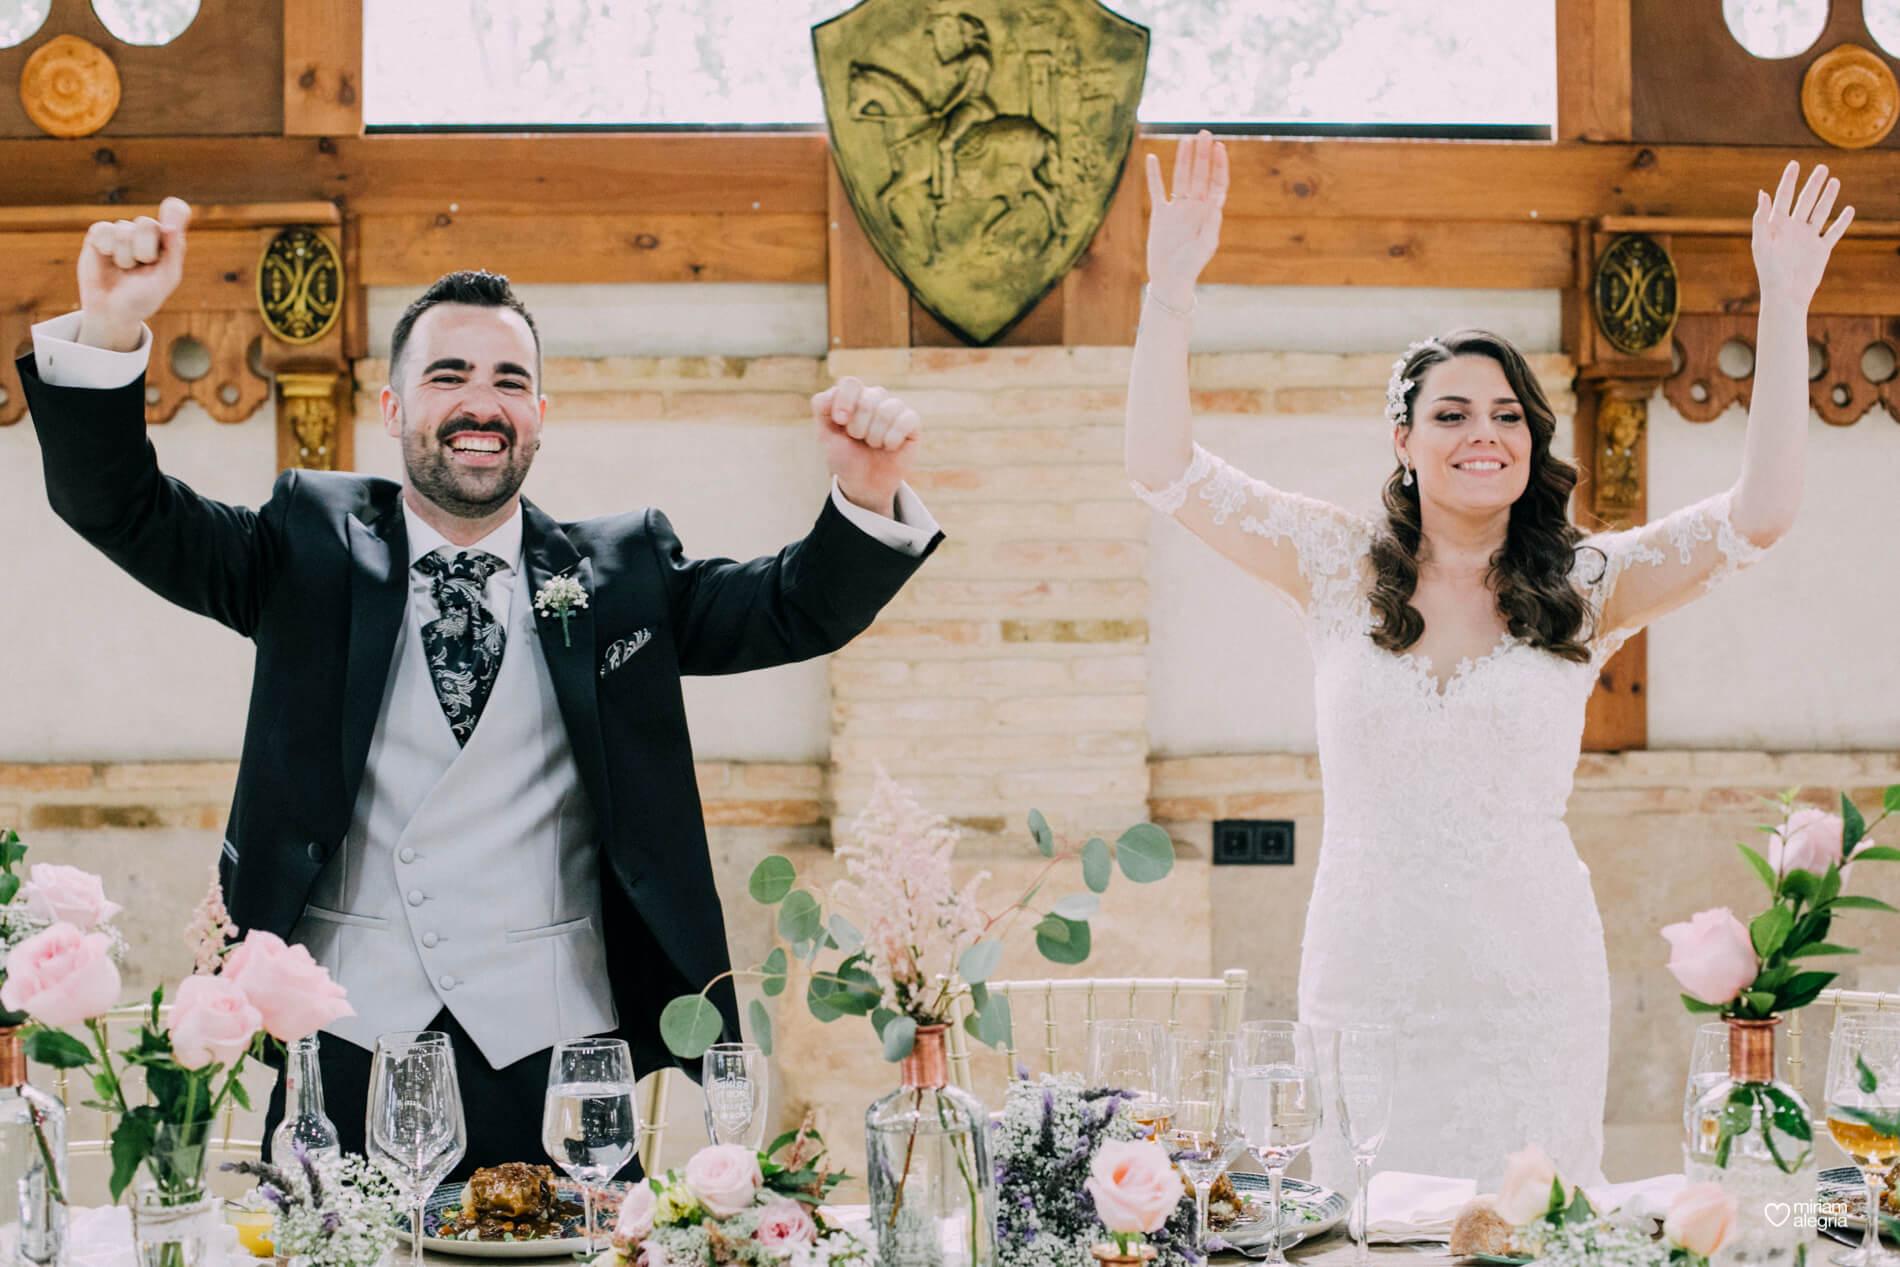 boda-en-finca-jurosa-miriam-alegria-108